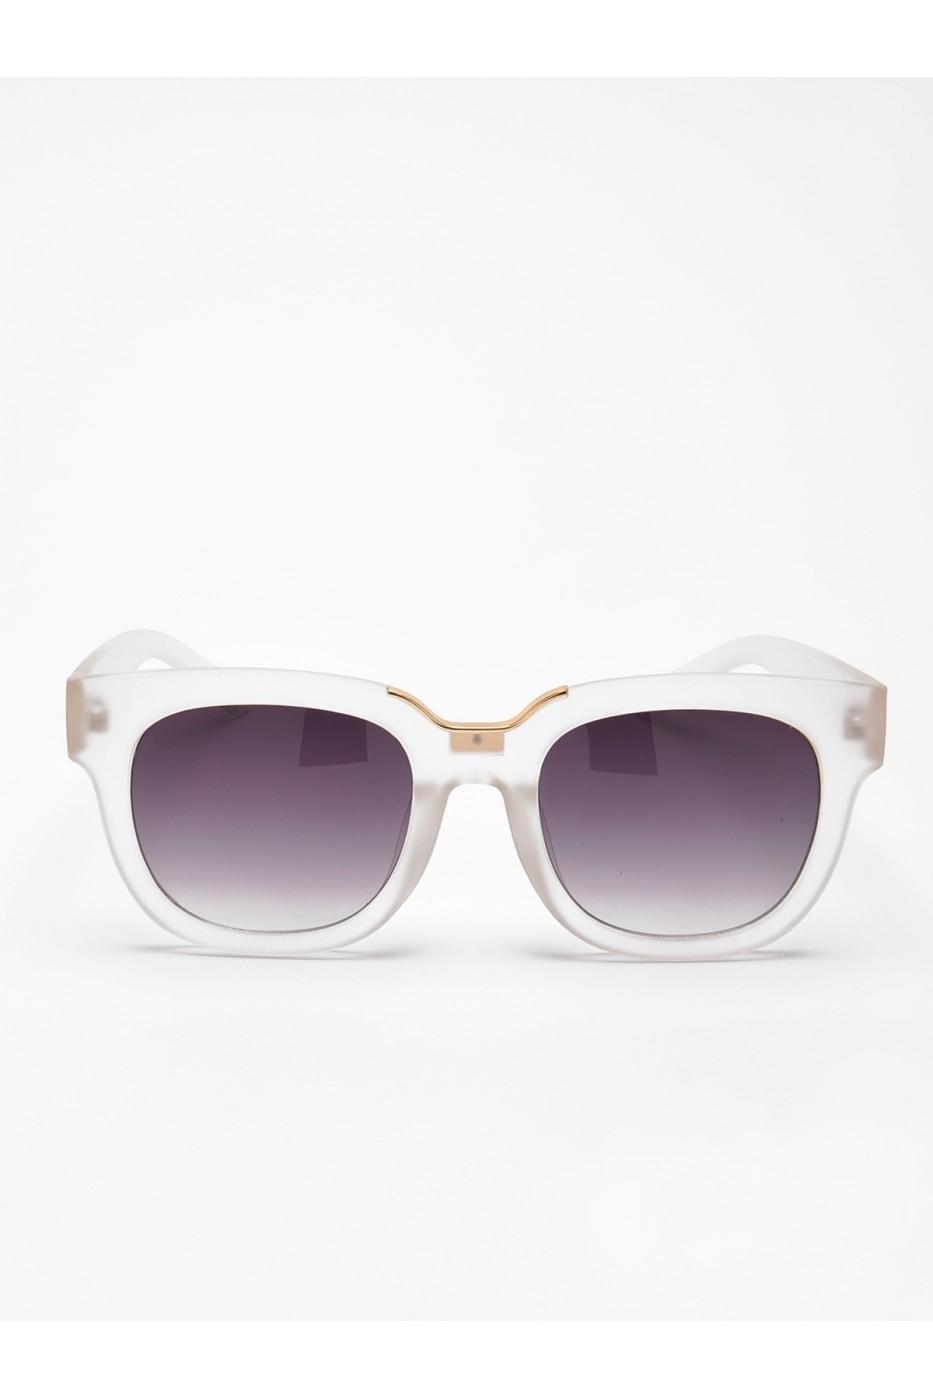 Ochelari de soare Troll cu rame albe alb - FashionUP! 5aae6b0028